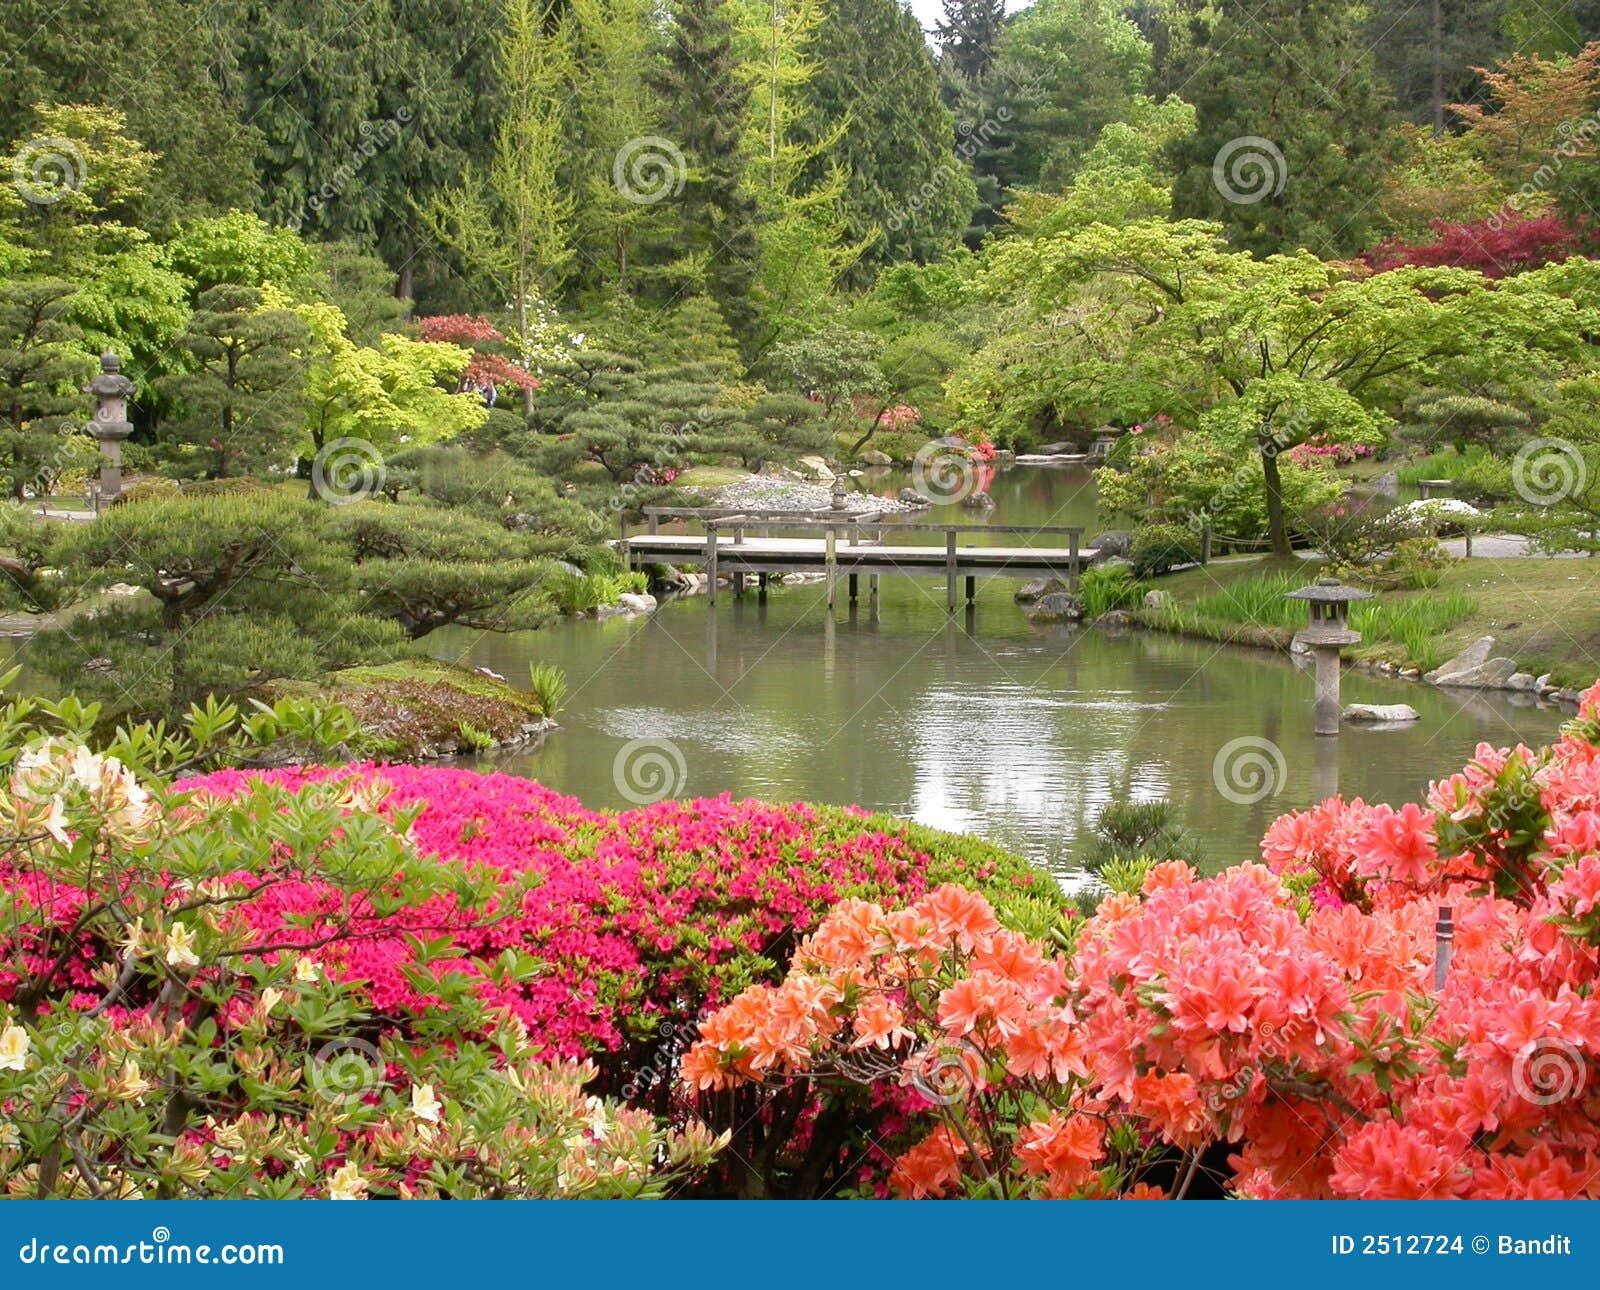 plantas para jardim japonesJardim japonês com as flores bonitas no